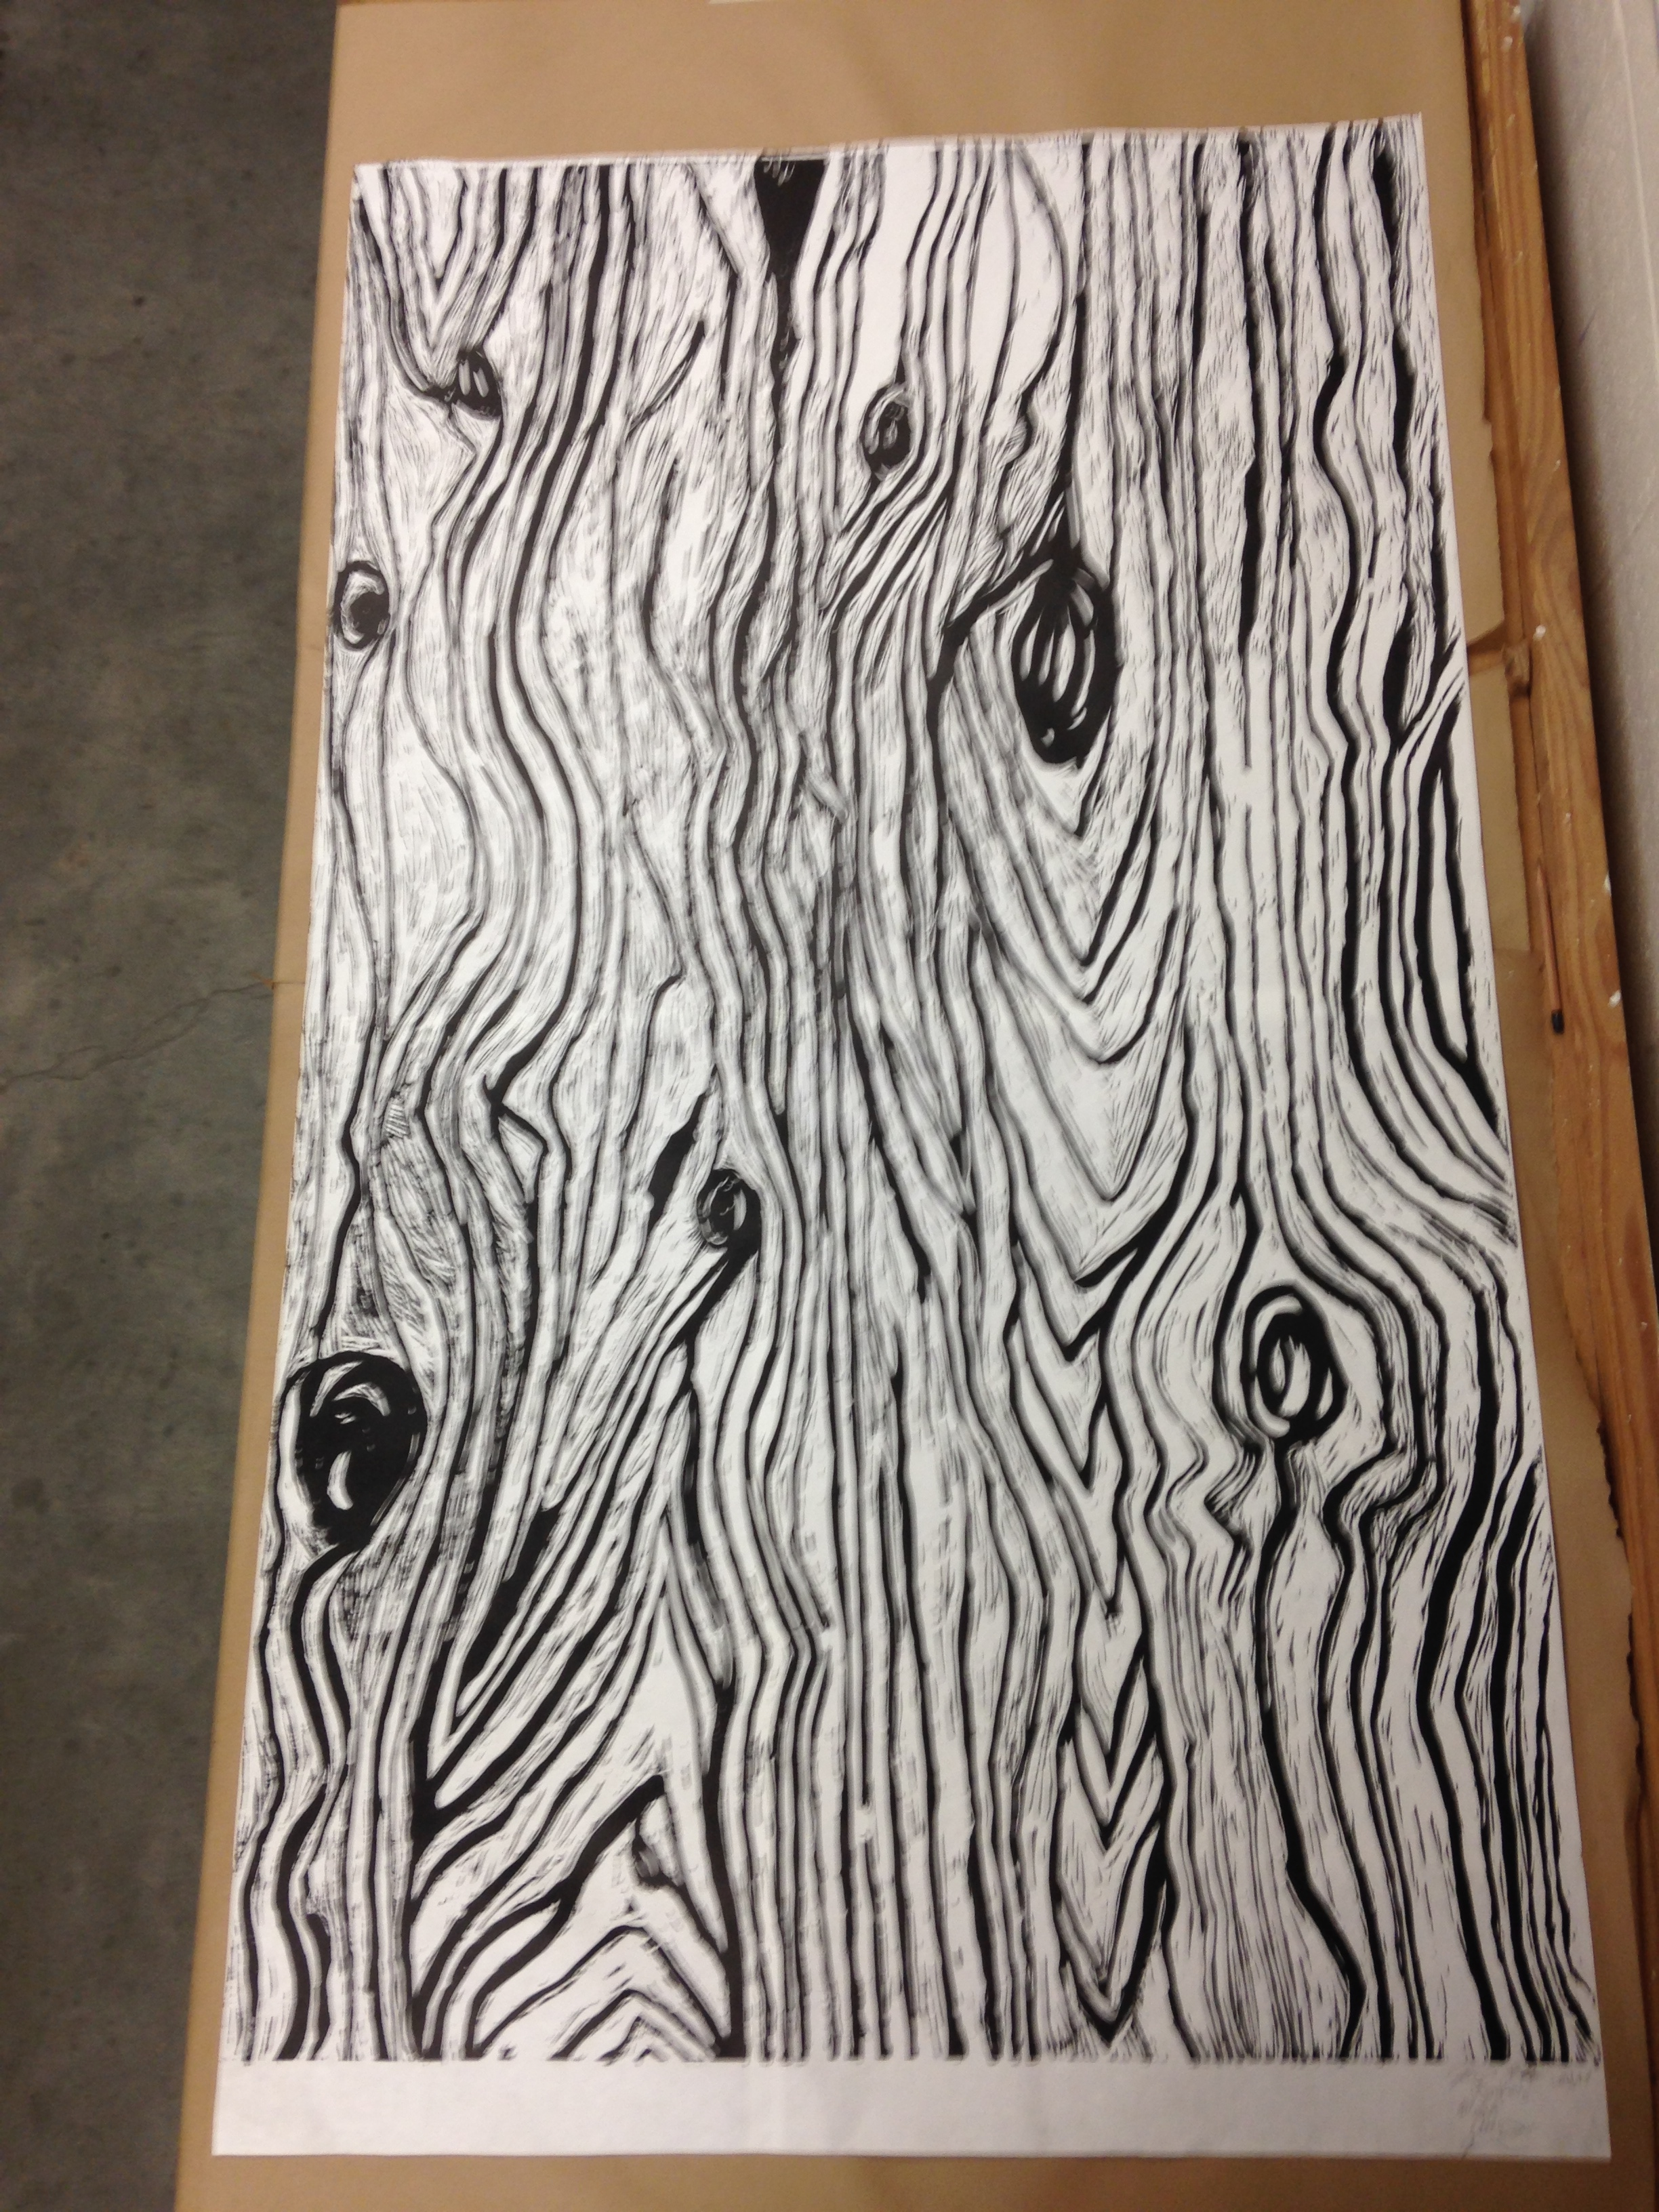 Large Scale Wood Block-SteamRoller